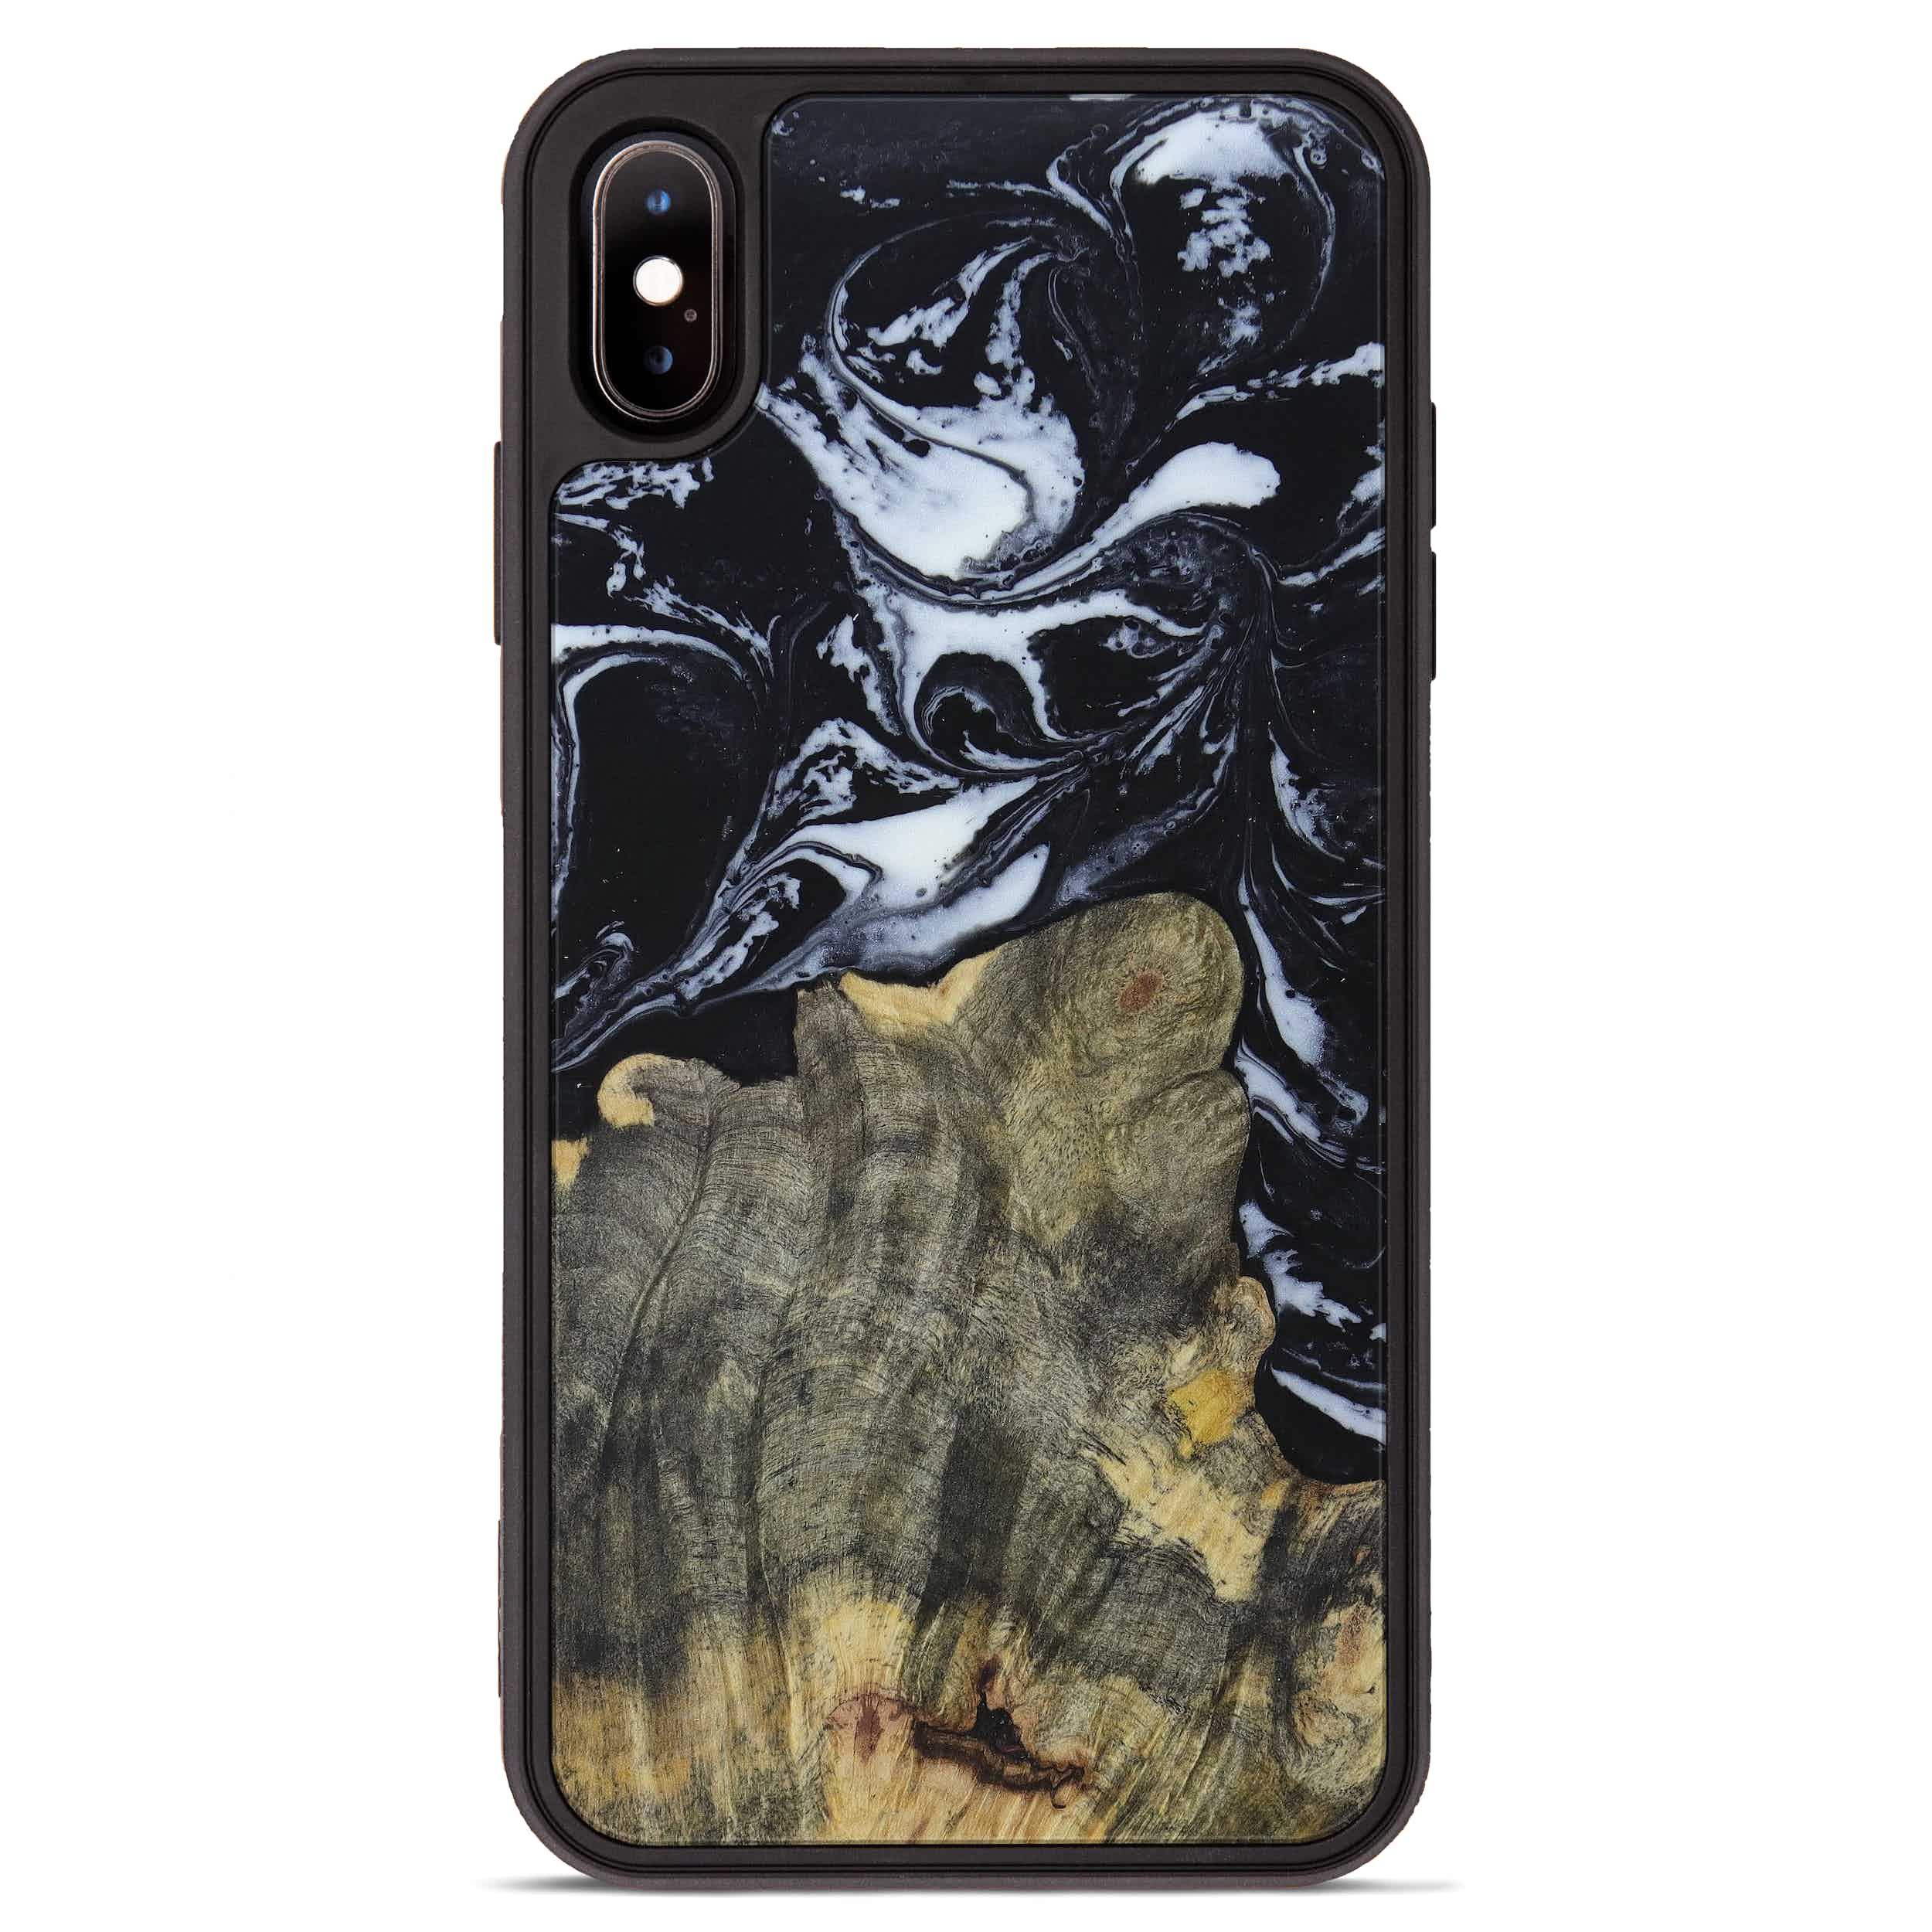 iPhone Xs Max Wood+Resin Phone Case - Faydra (Black & White, 397354)